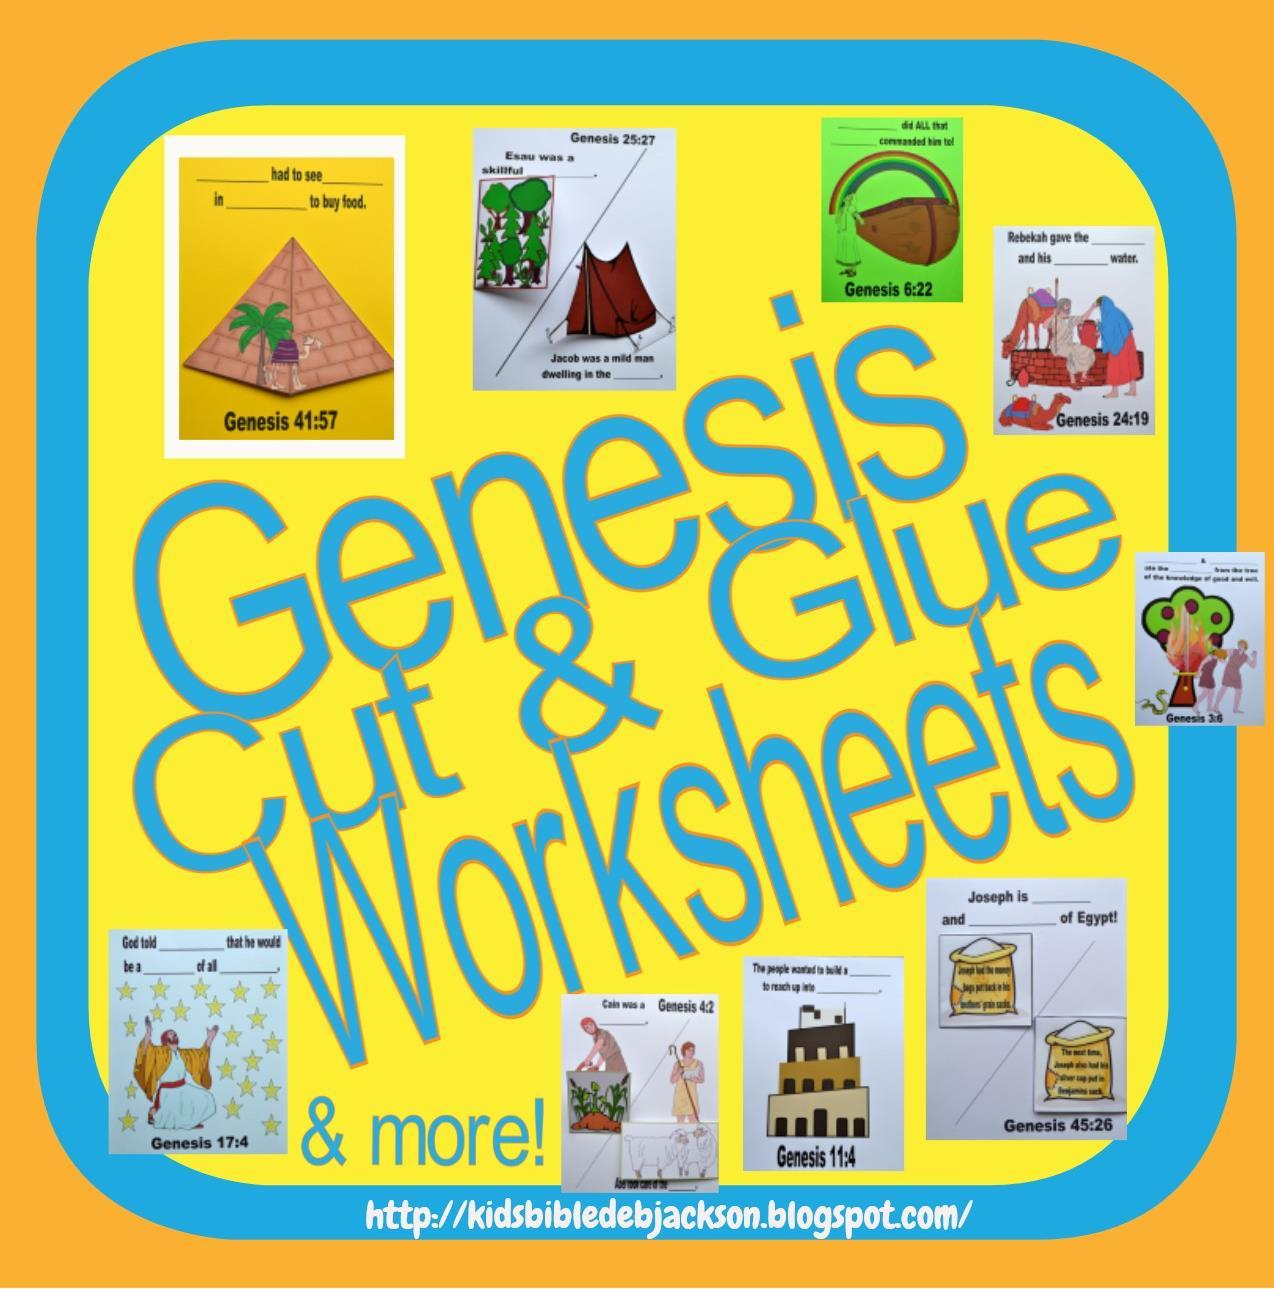 http://kidsbibledebjackson.blogspot.com/2013/05/genesis-lapbook-cut-glue-student.html